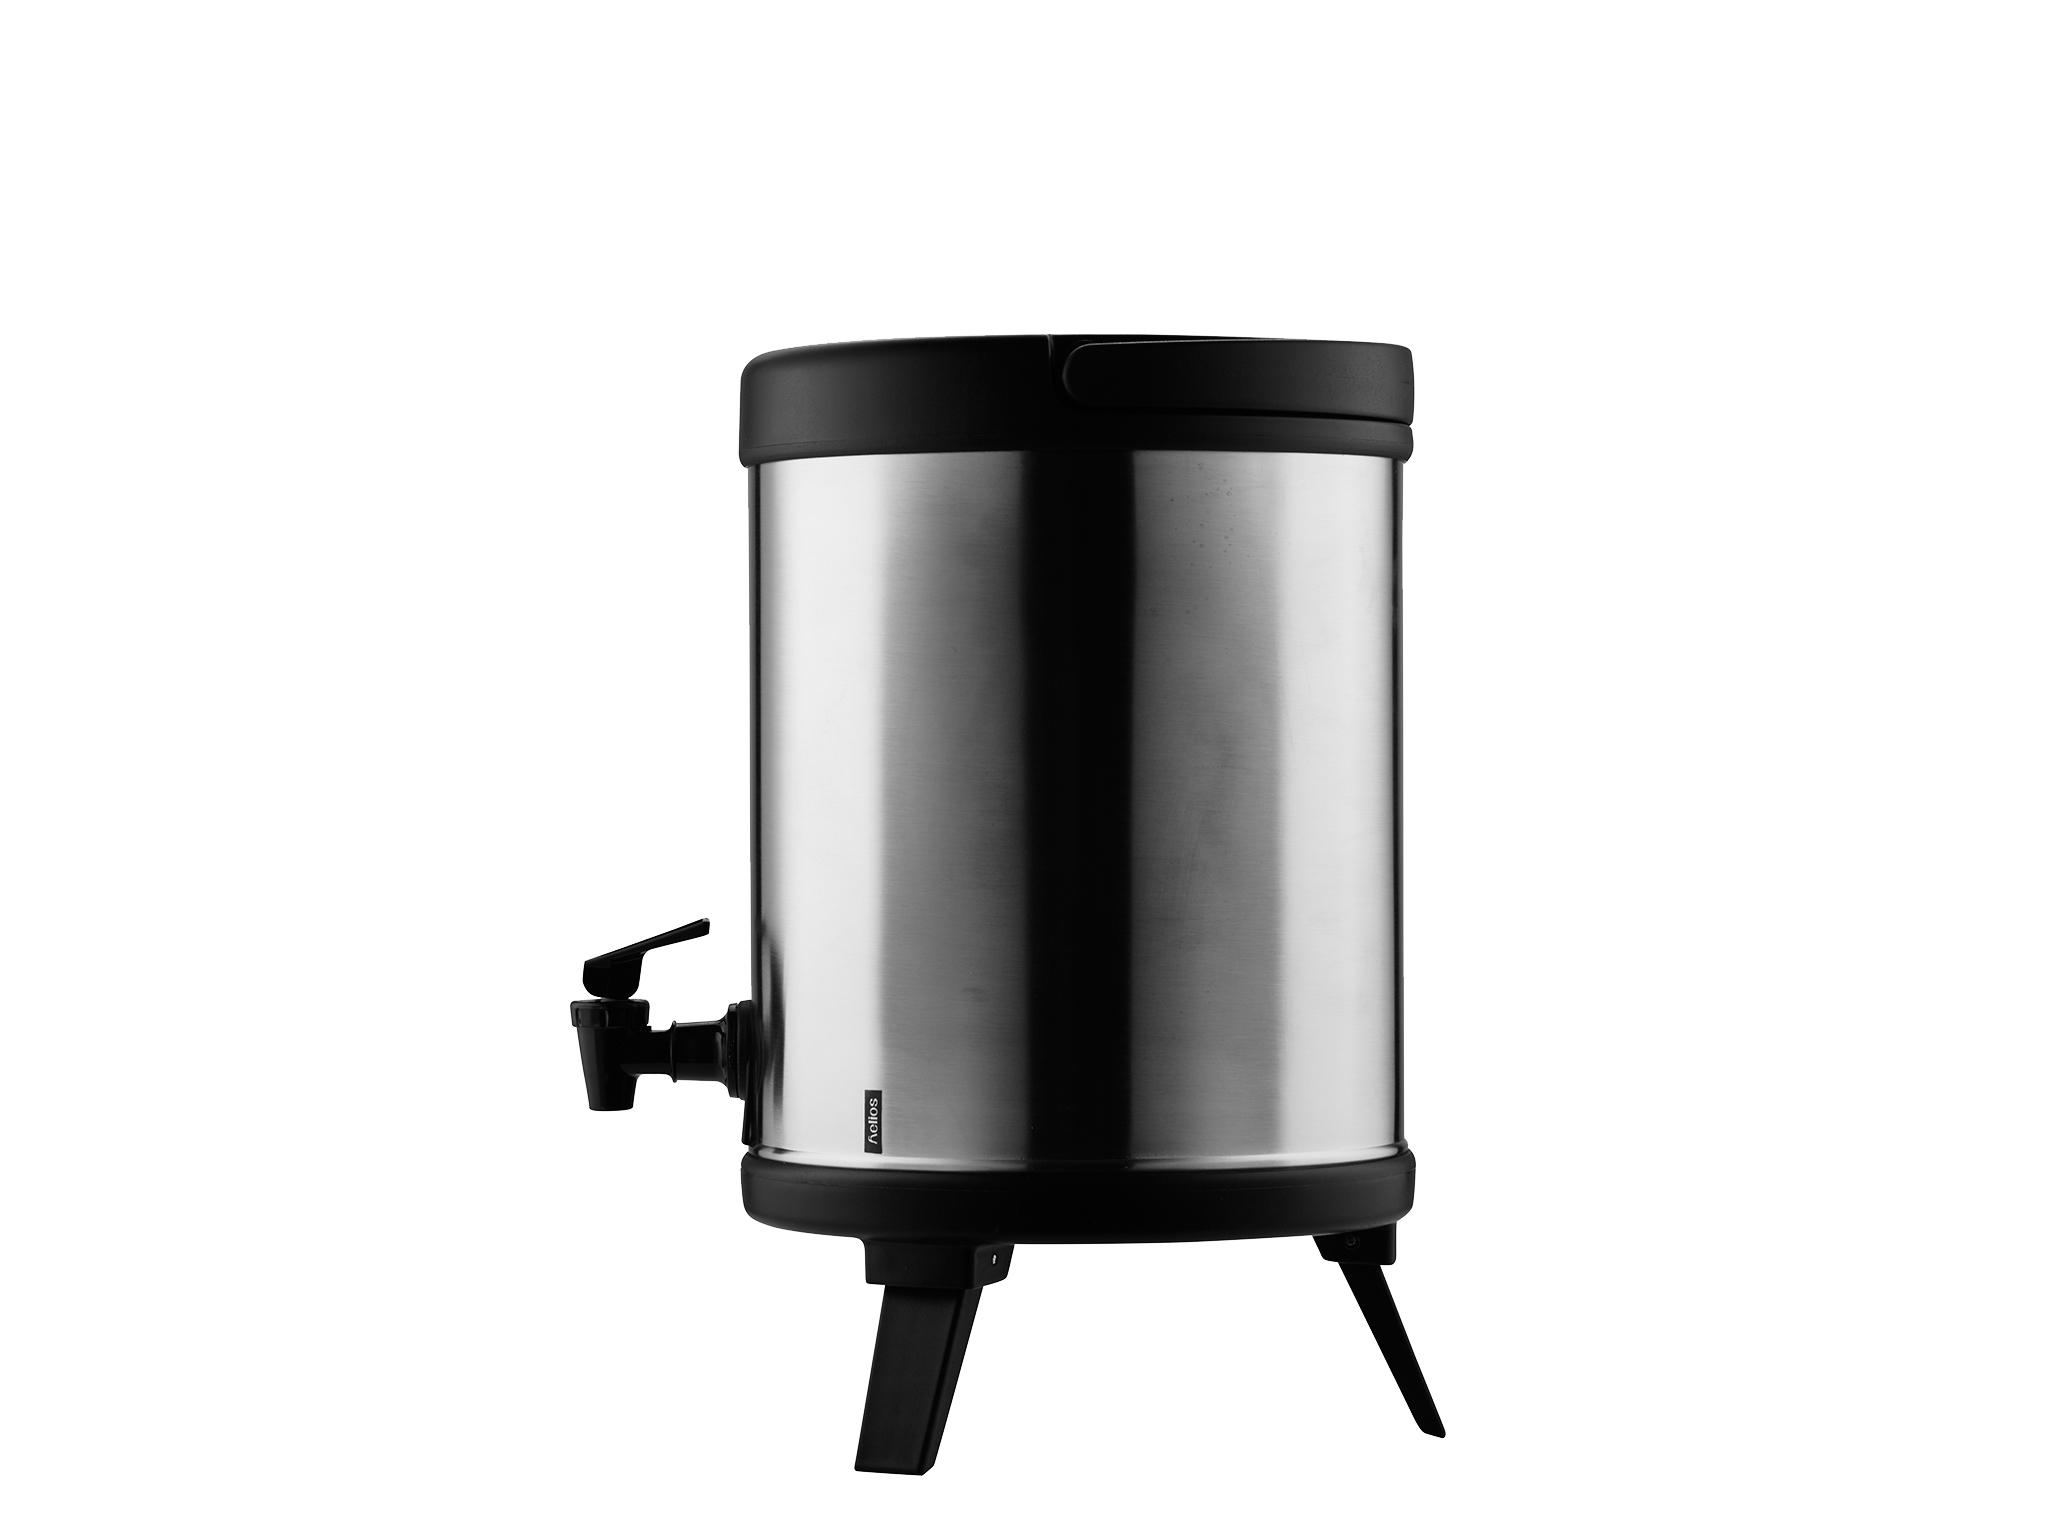 8306 - Vacuum tank SS with tap 6.0 L MAXX - Helios